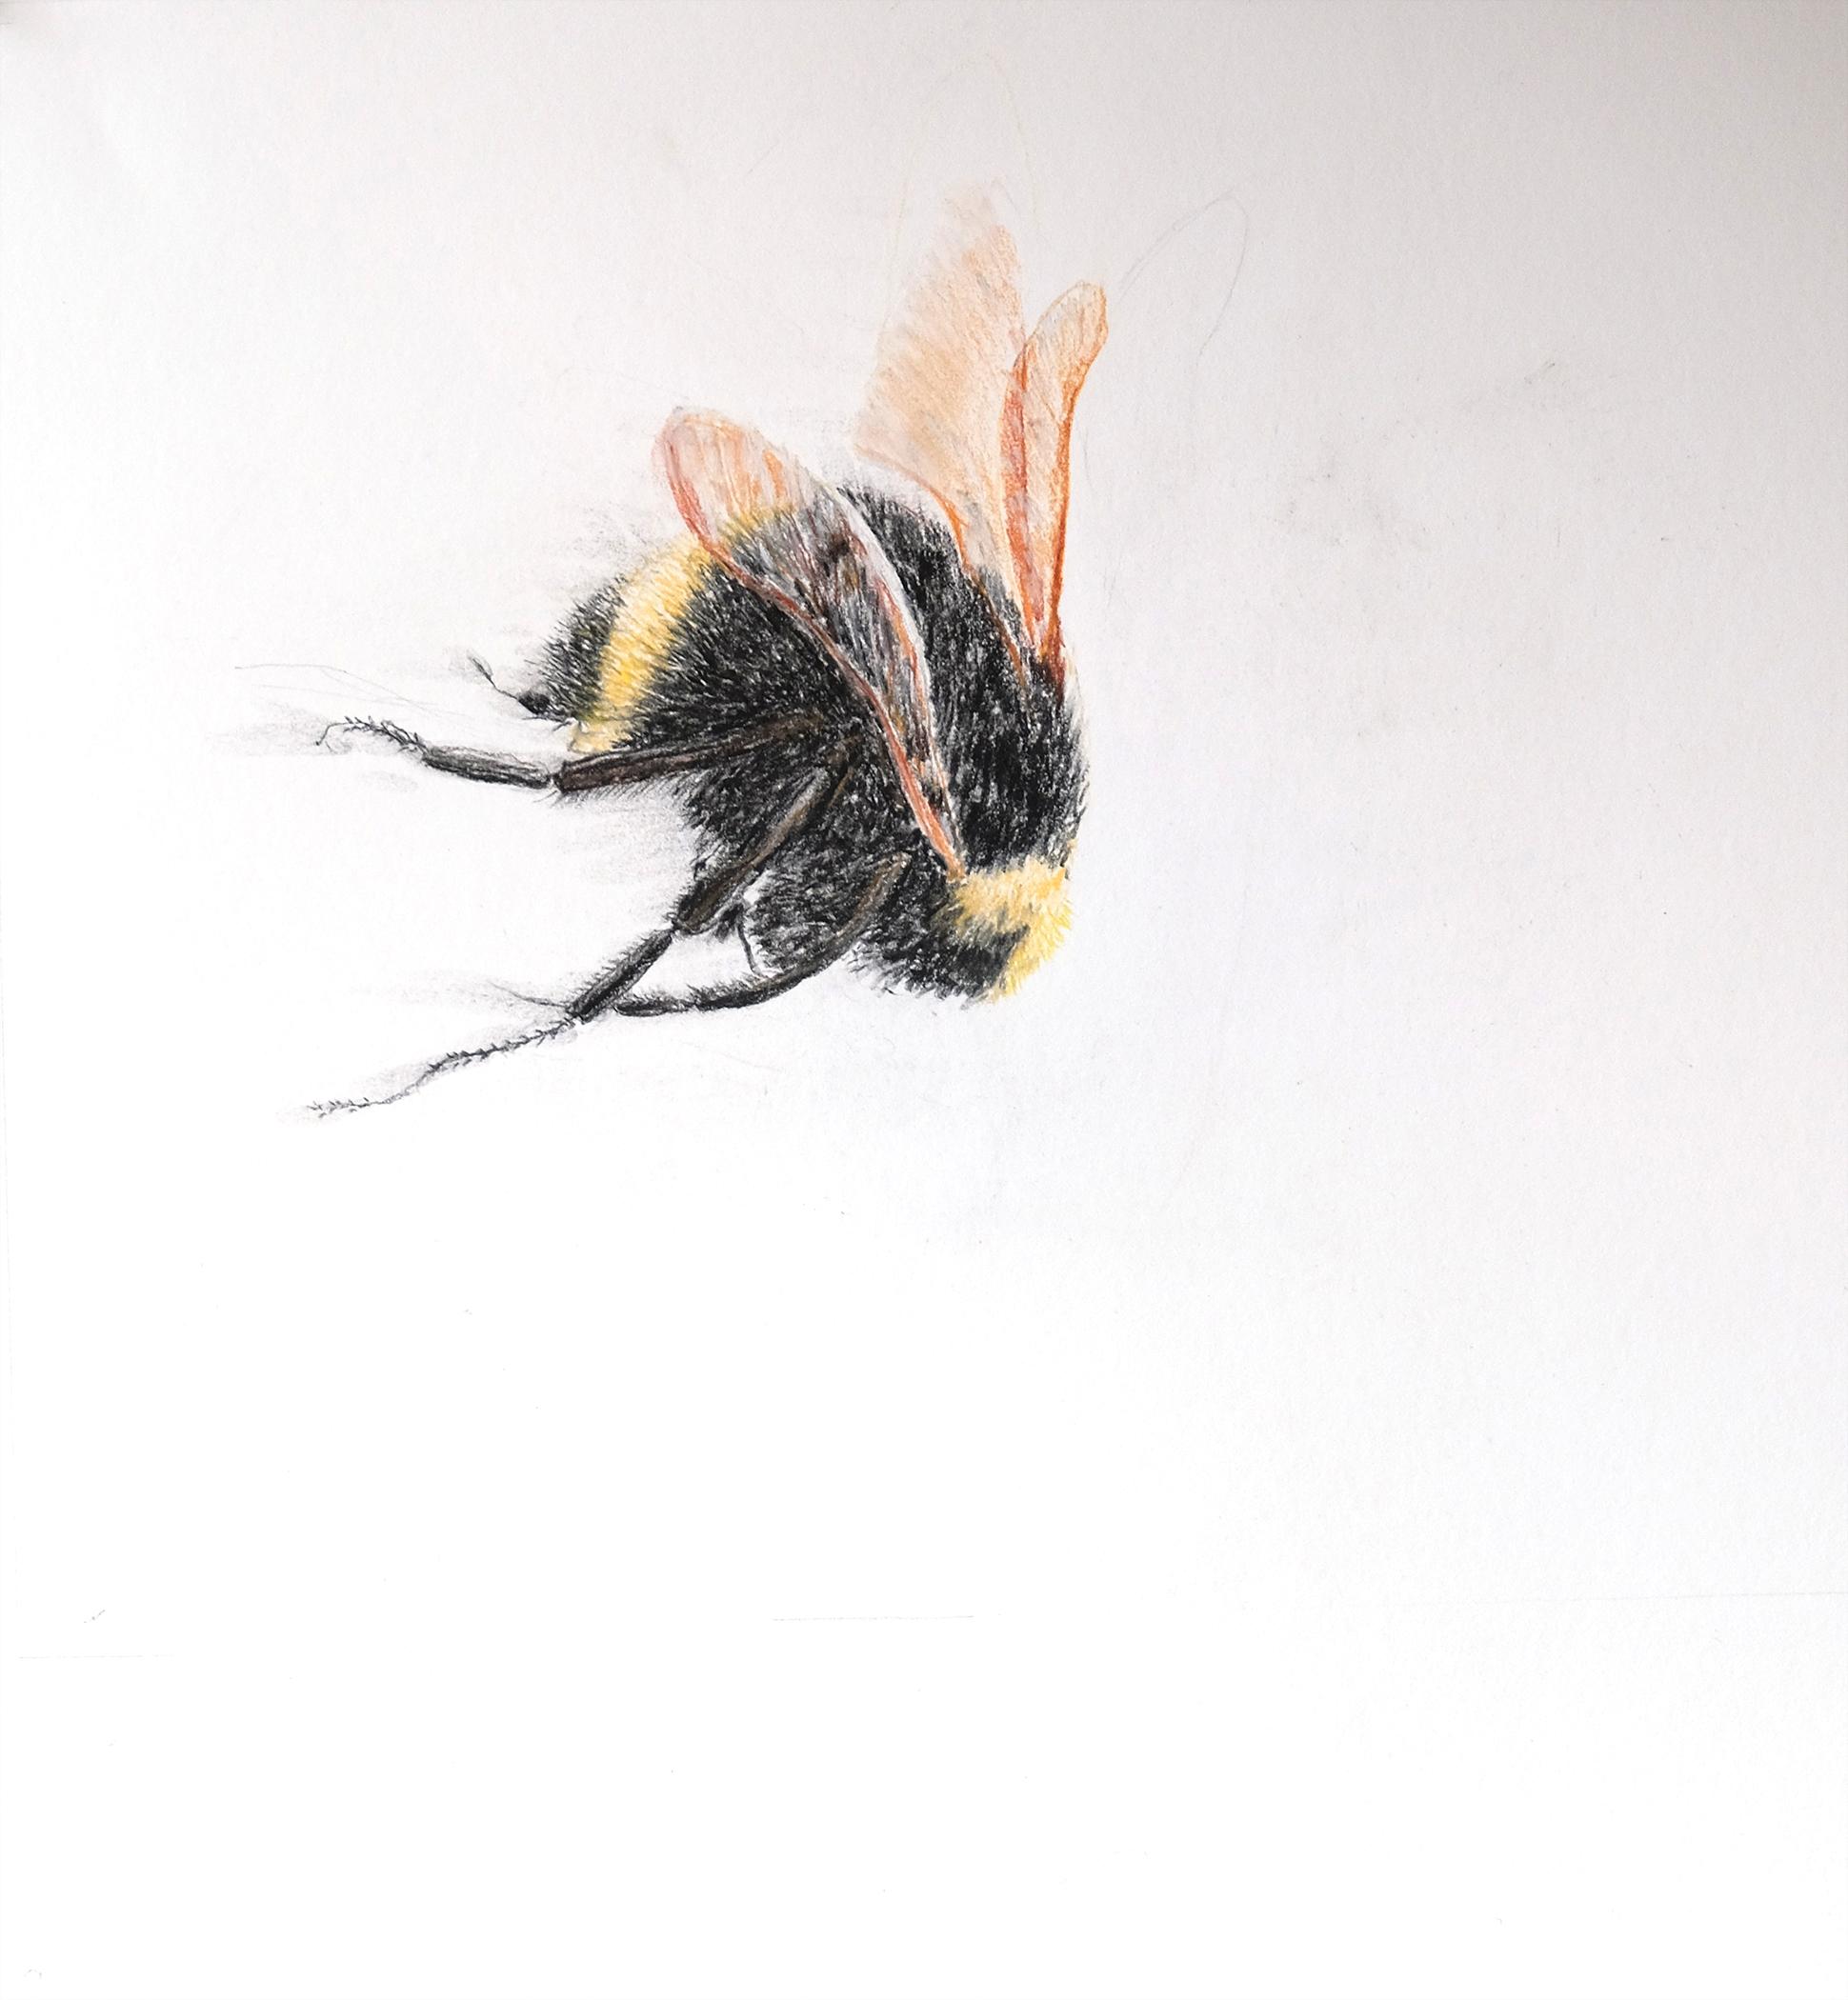 Bumble bee 3.jpg